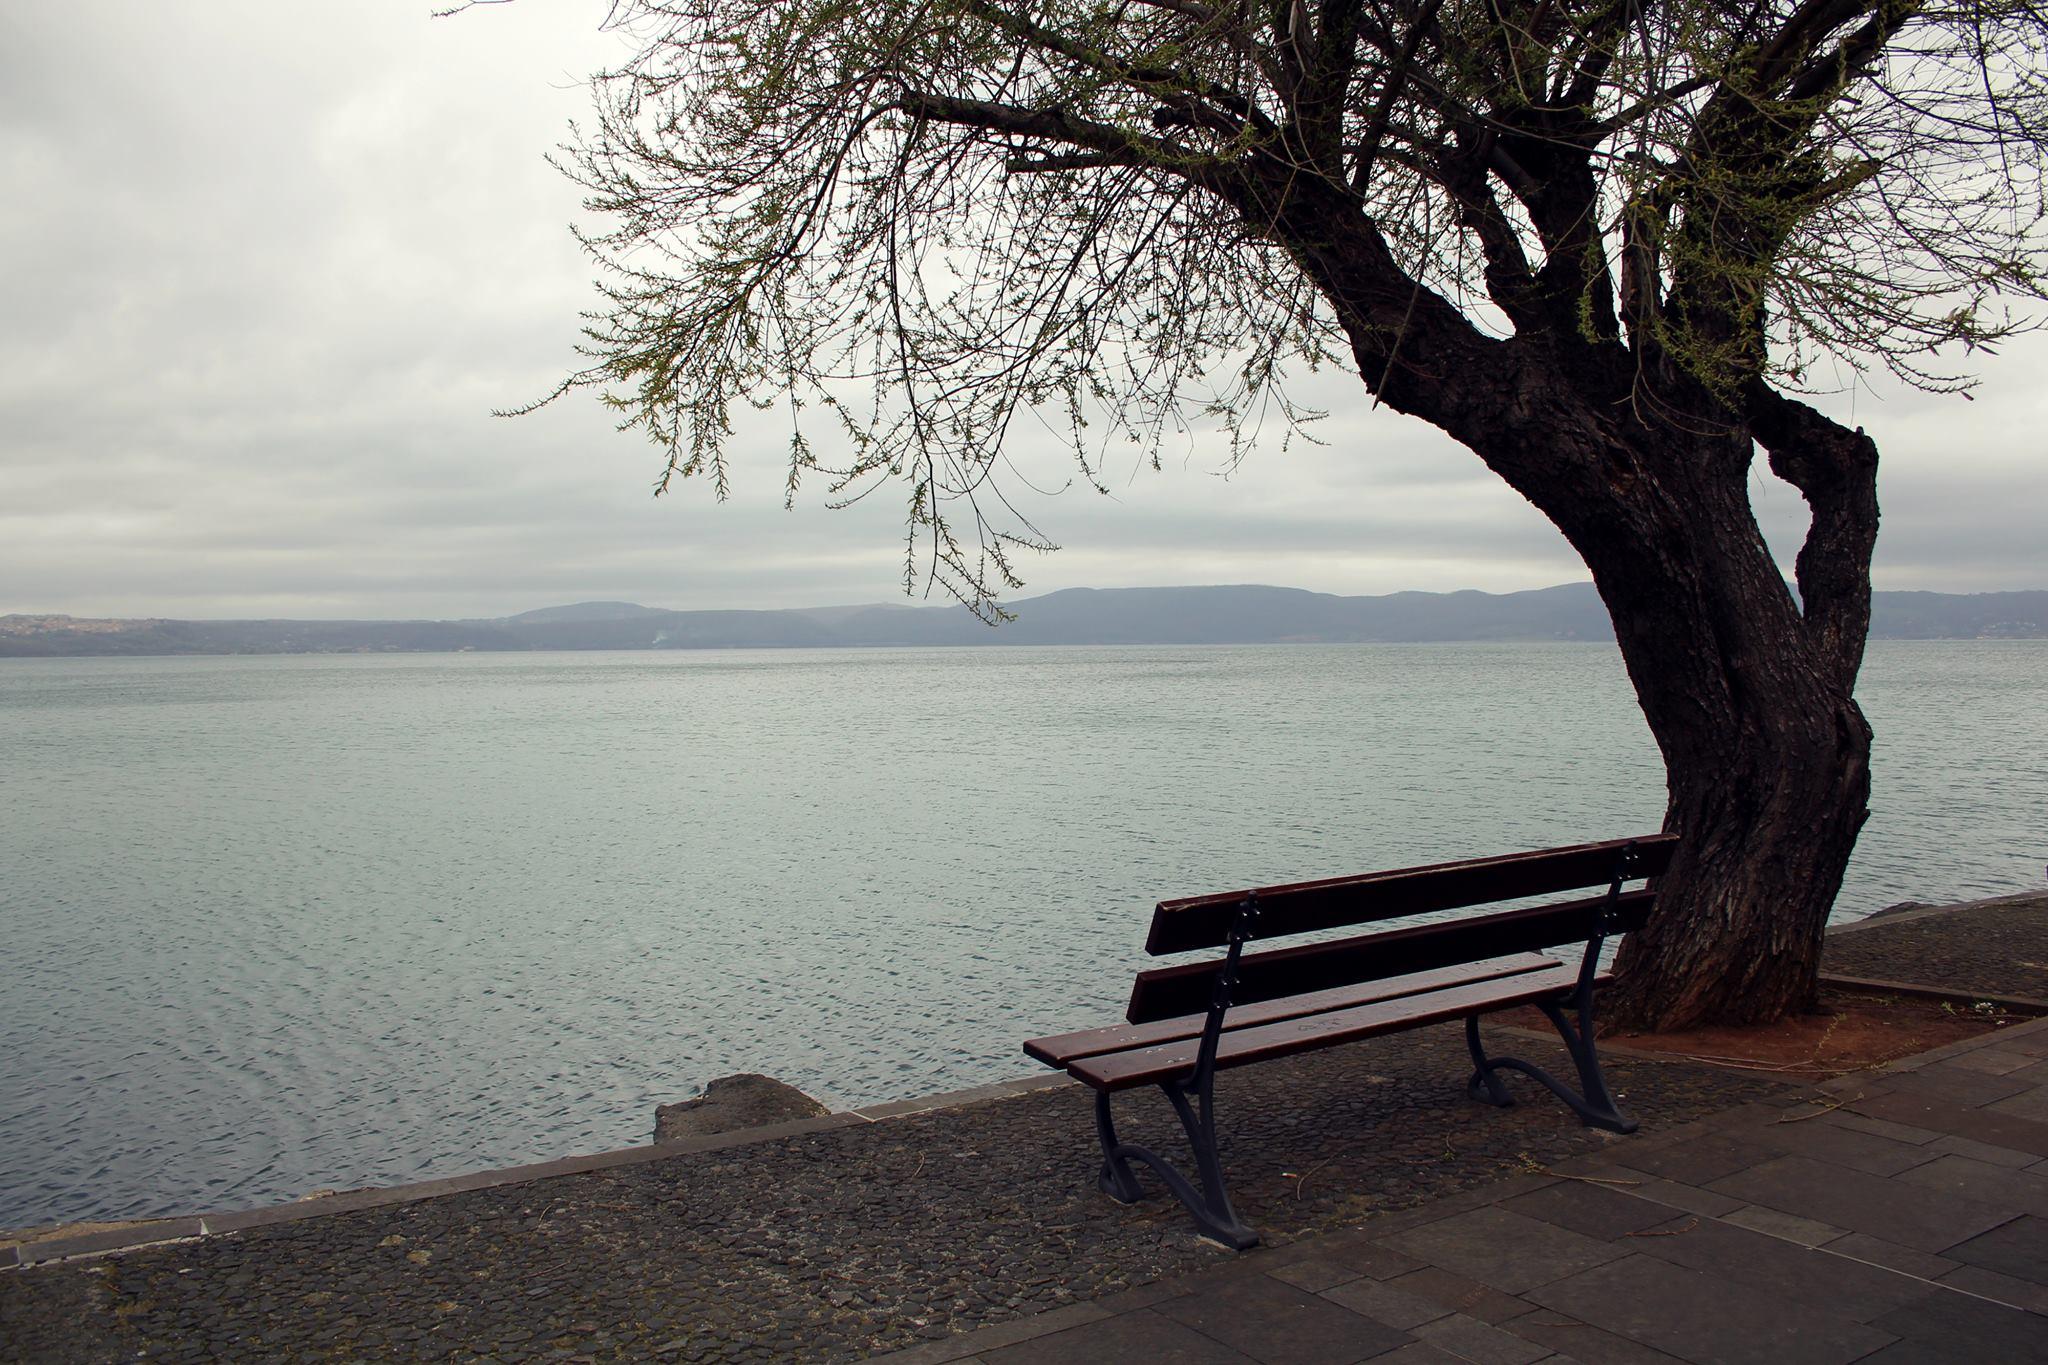 amore fra di noi in silenzio in riva al lago